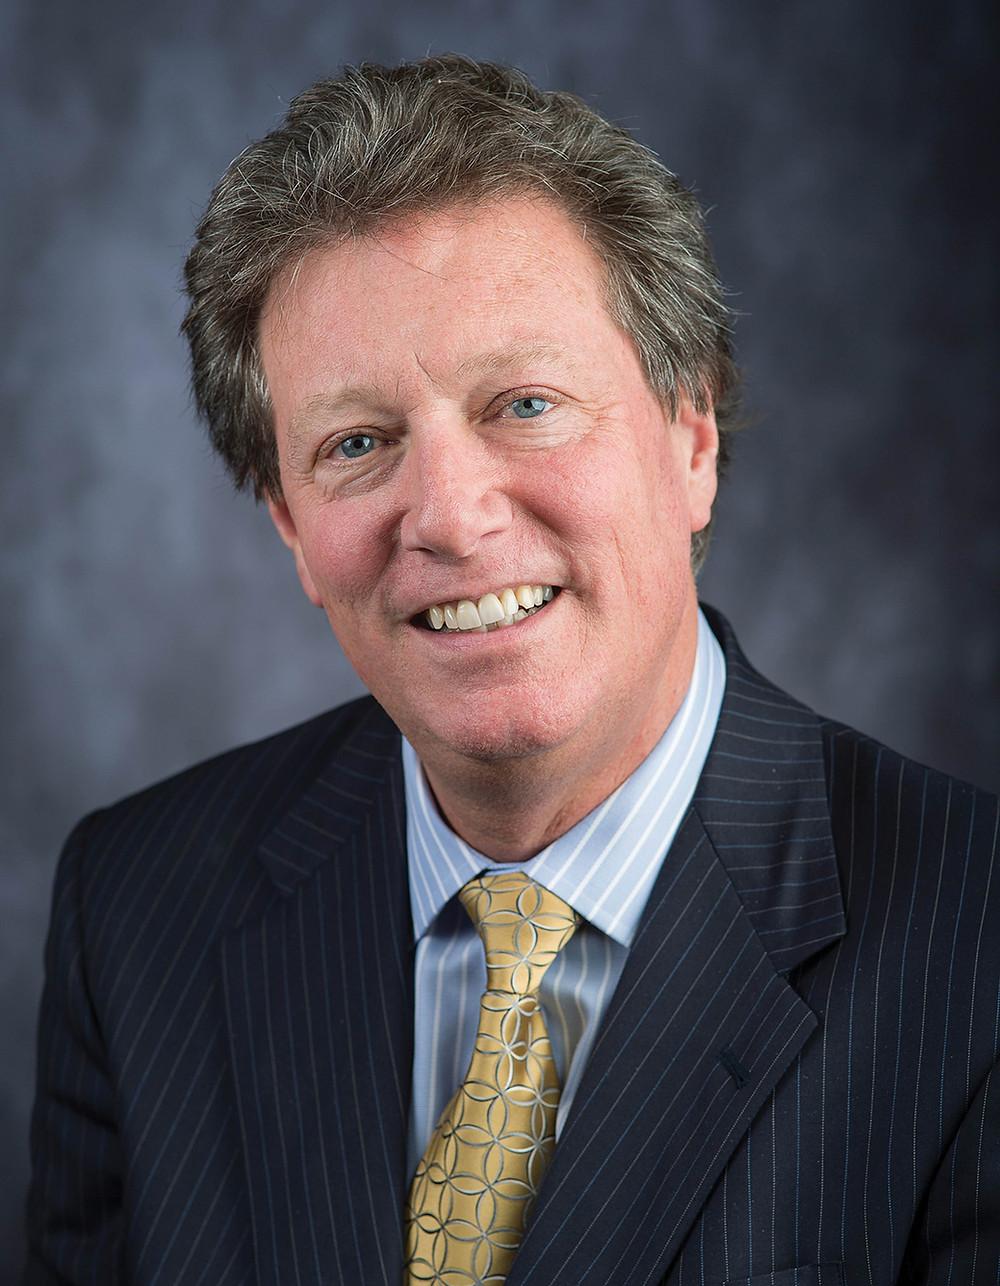 Charles Hadden